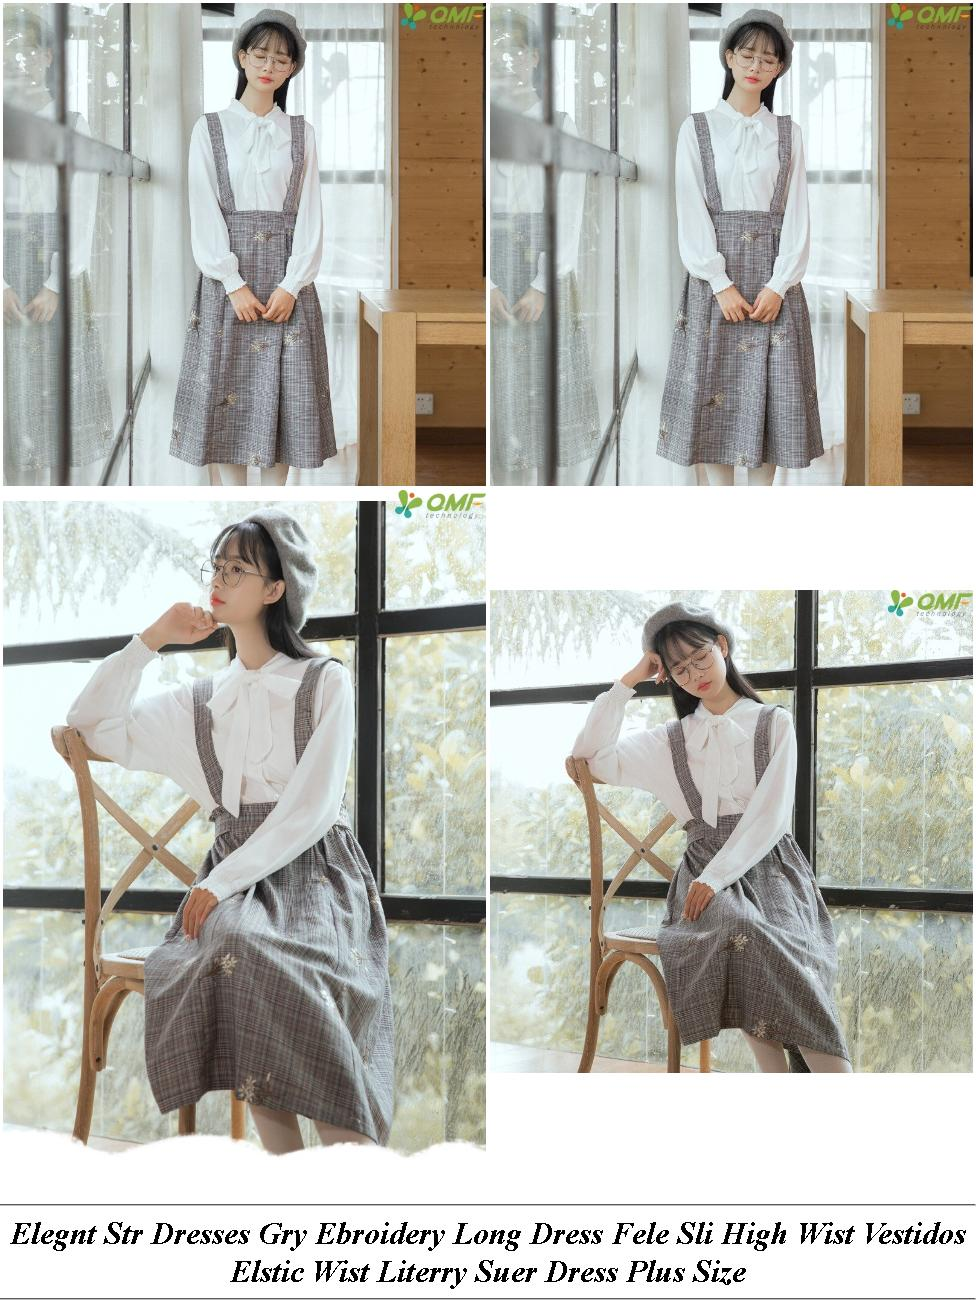 Plus Size Evening Dresses Amazon - Warehouse Clothes Sale Singapore - New Trendy Dresses For Wedding